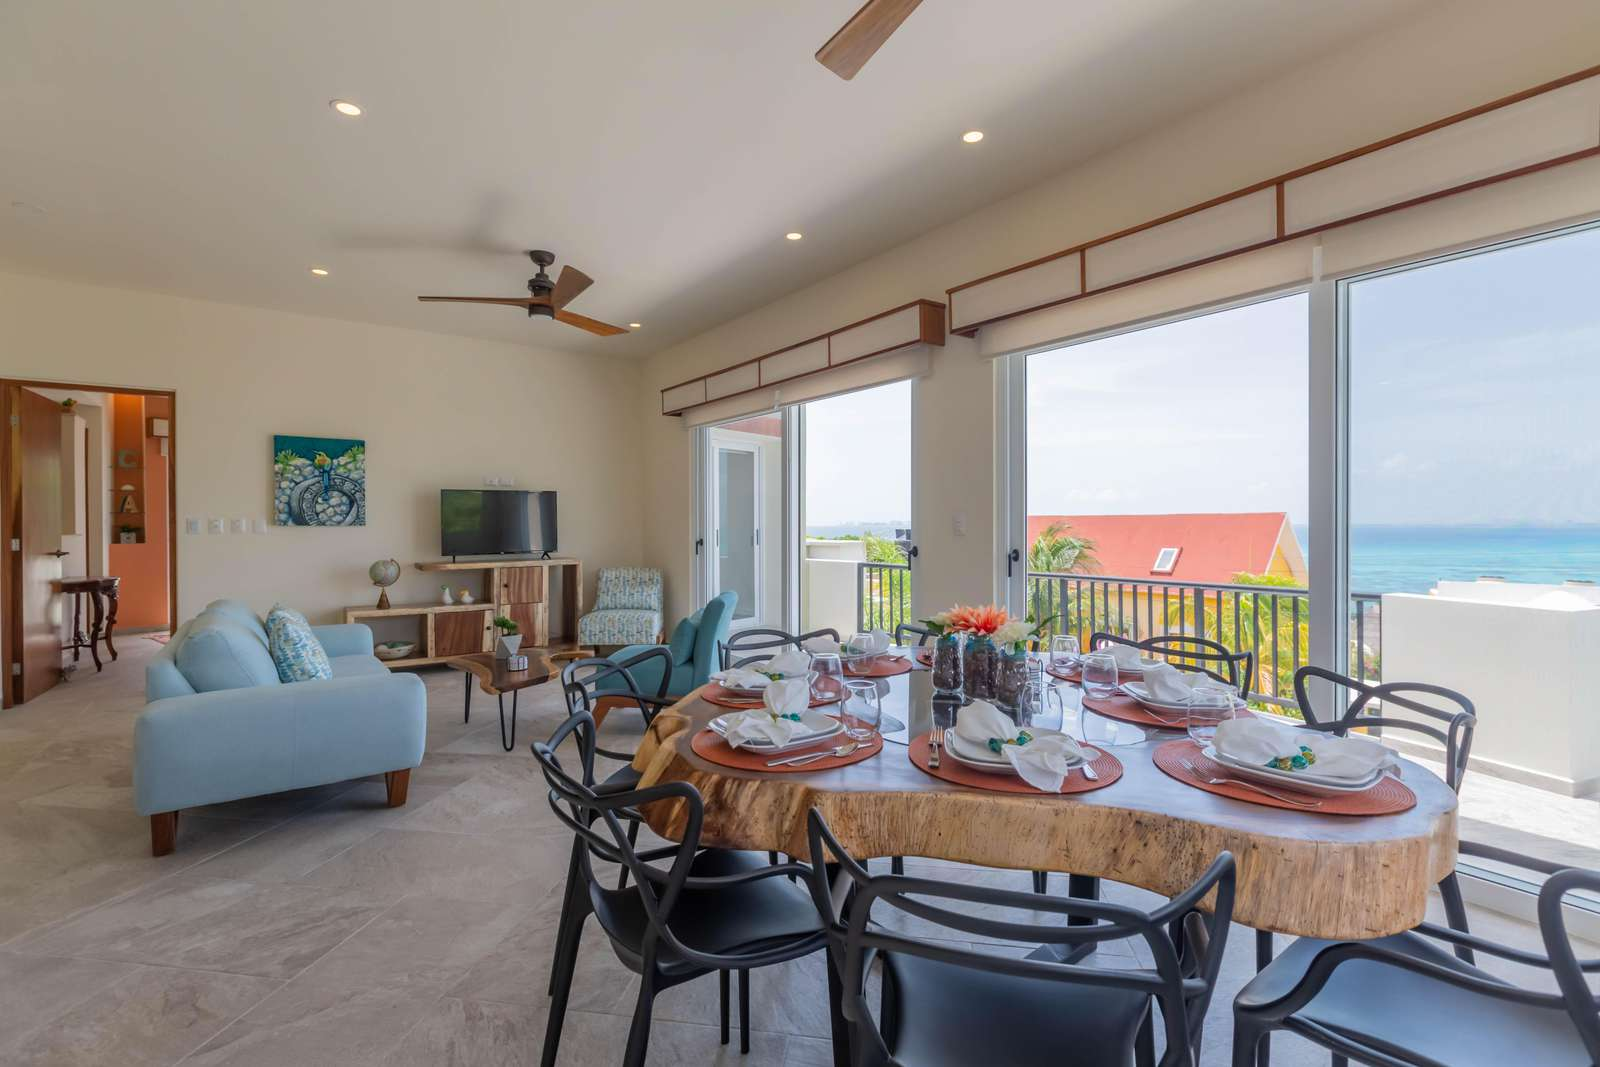 2nd Floor Living Room/Dining Room